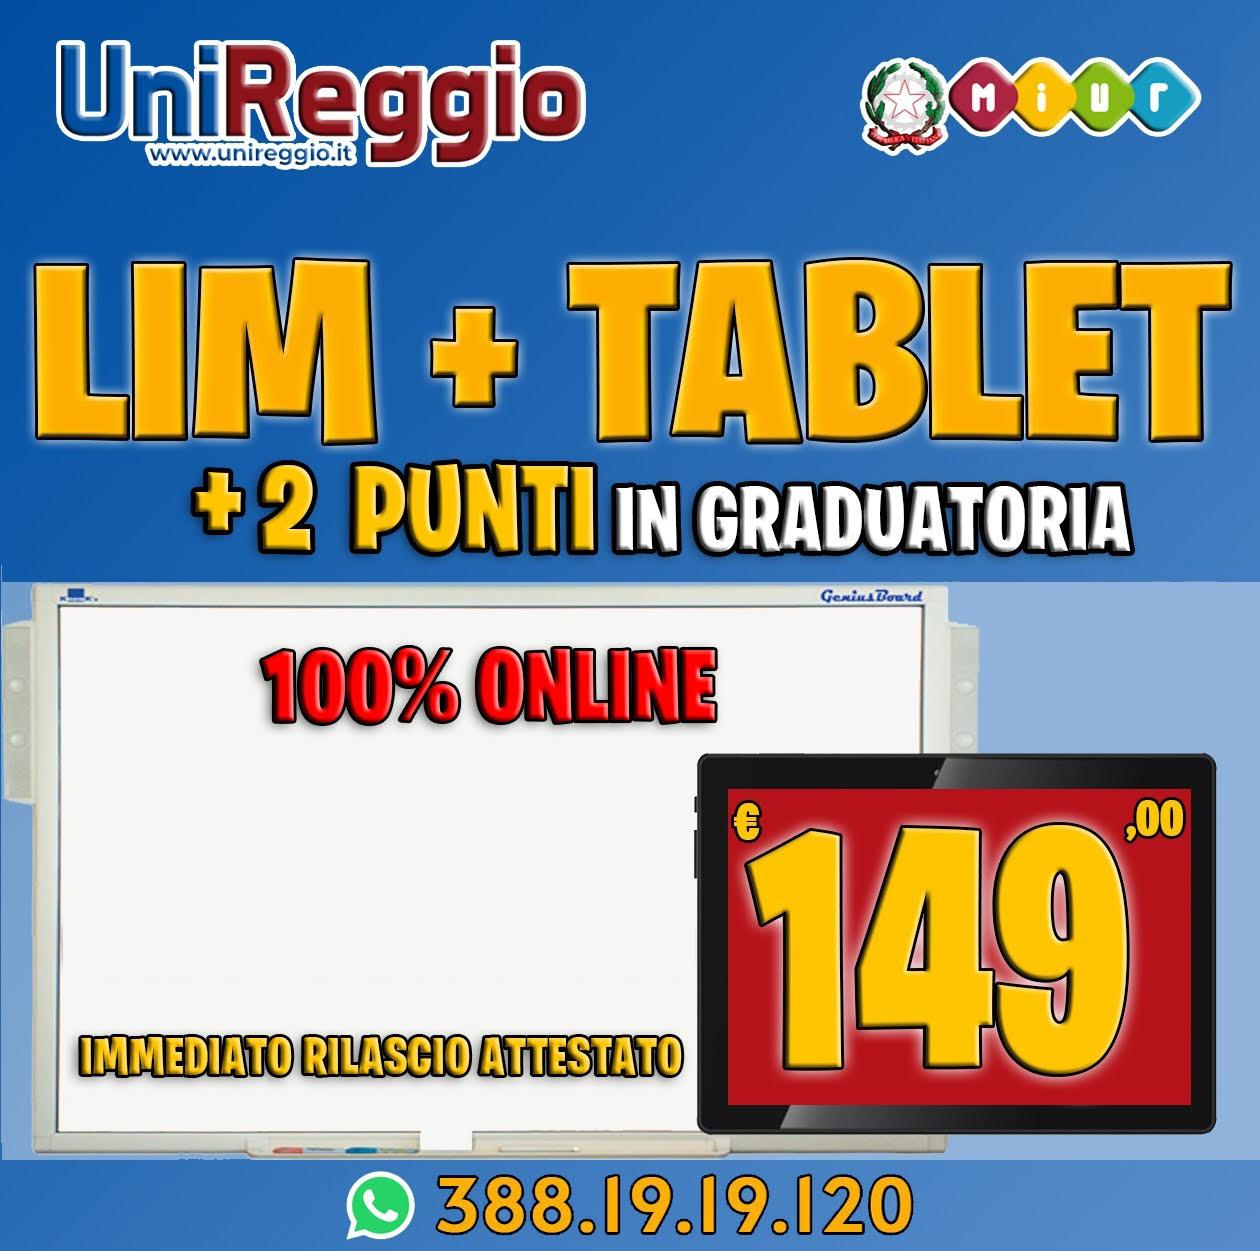 CORSO LIM 200 ORE + CORSO TABLET (+2,00 PUNTI)